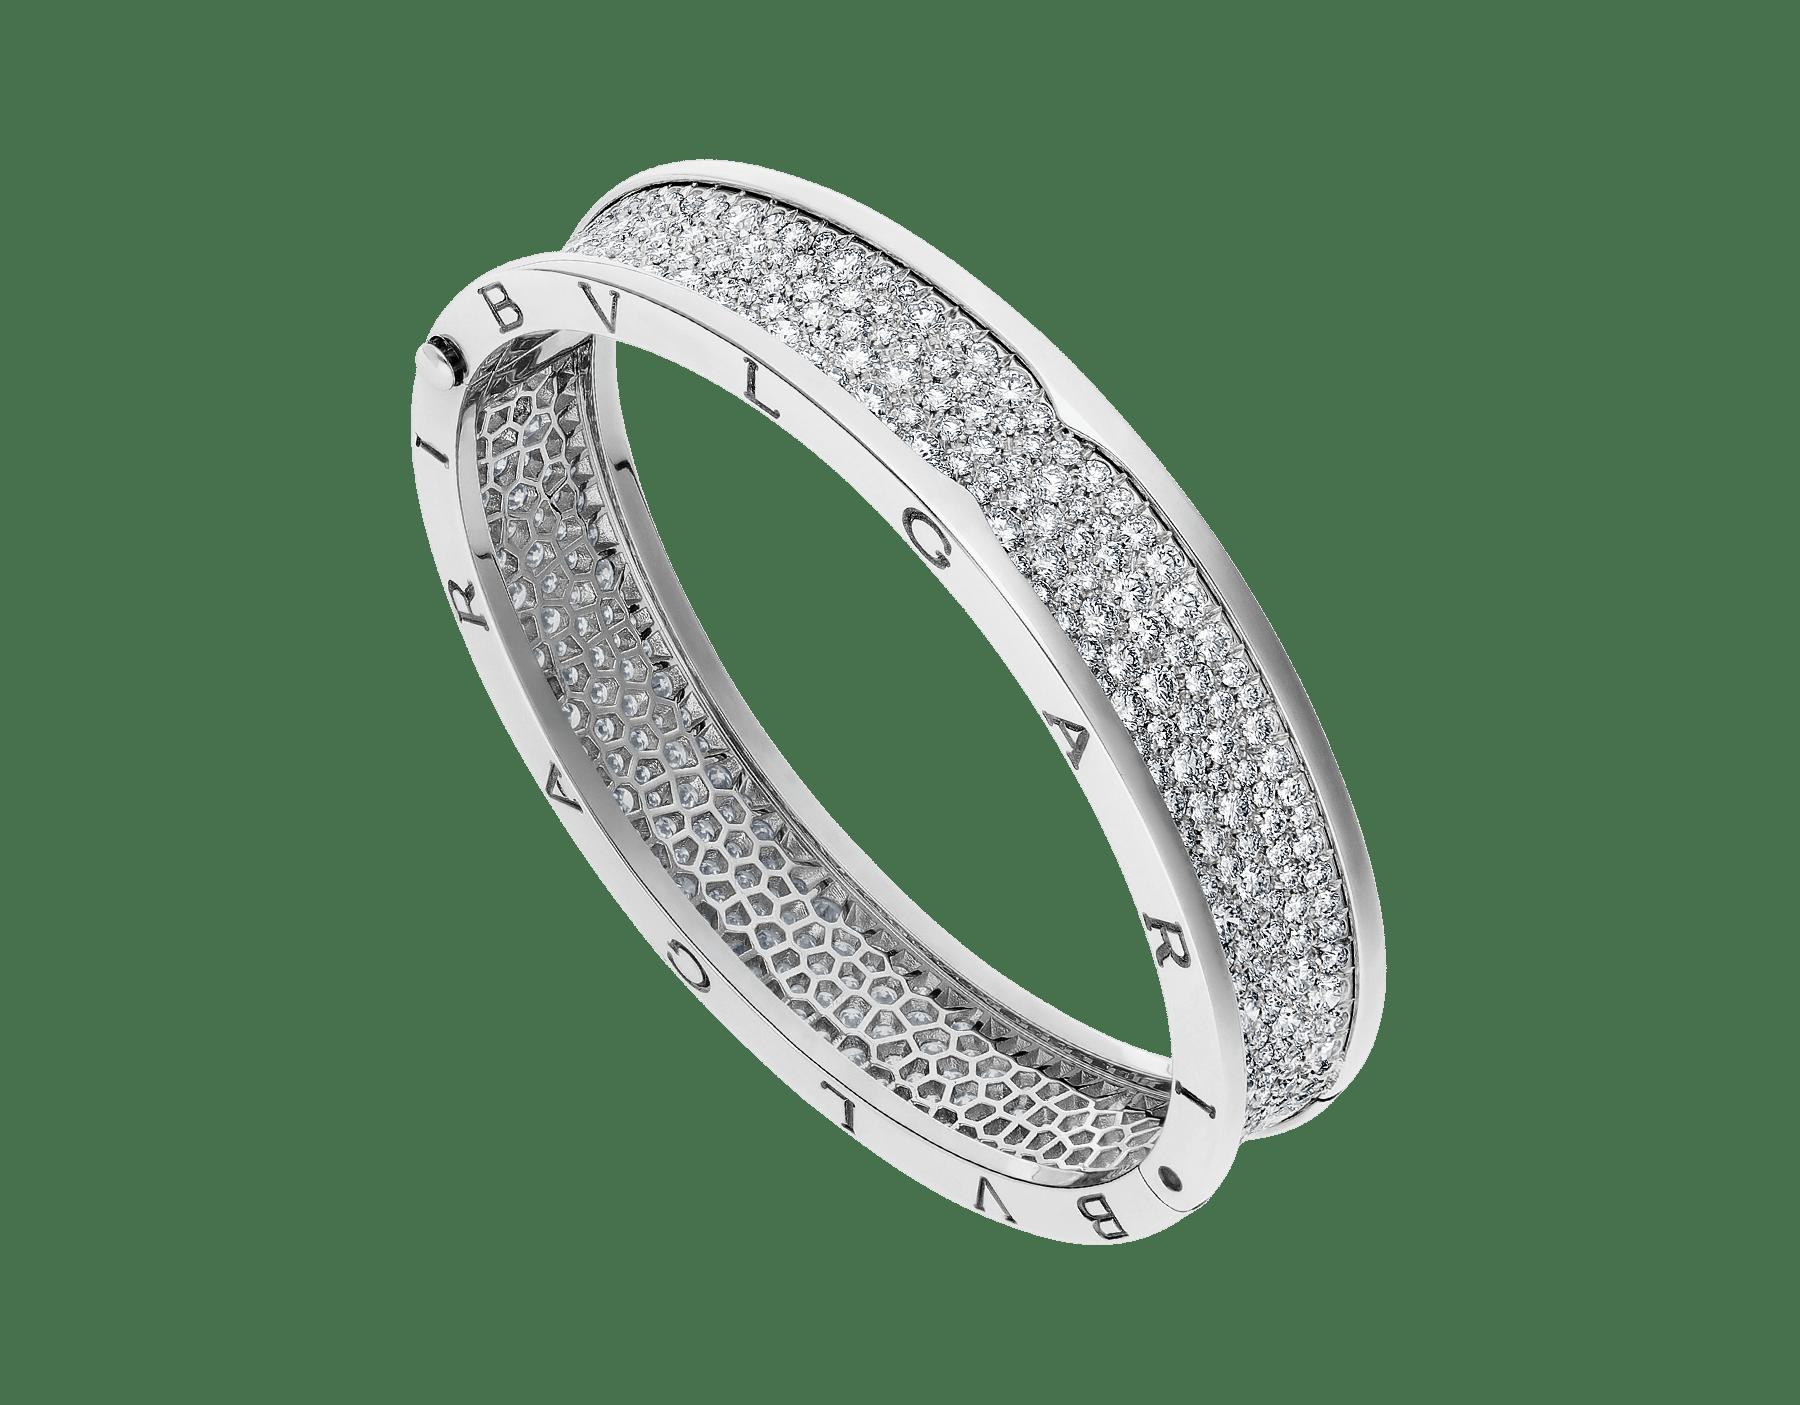 B.zero1 large bangle bracelet in 18 kt white gold set with pavé diamonds on the spiral. BR856218 image 1